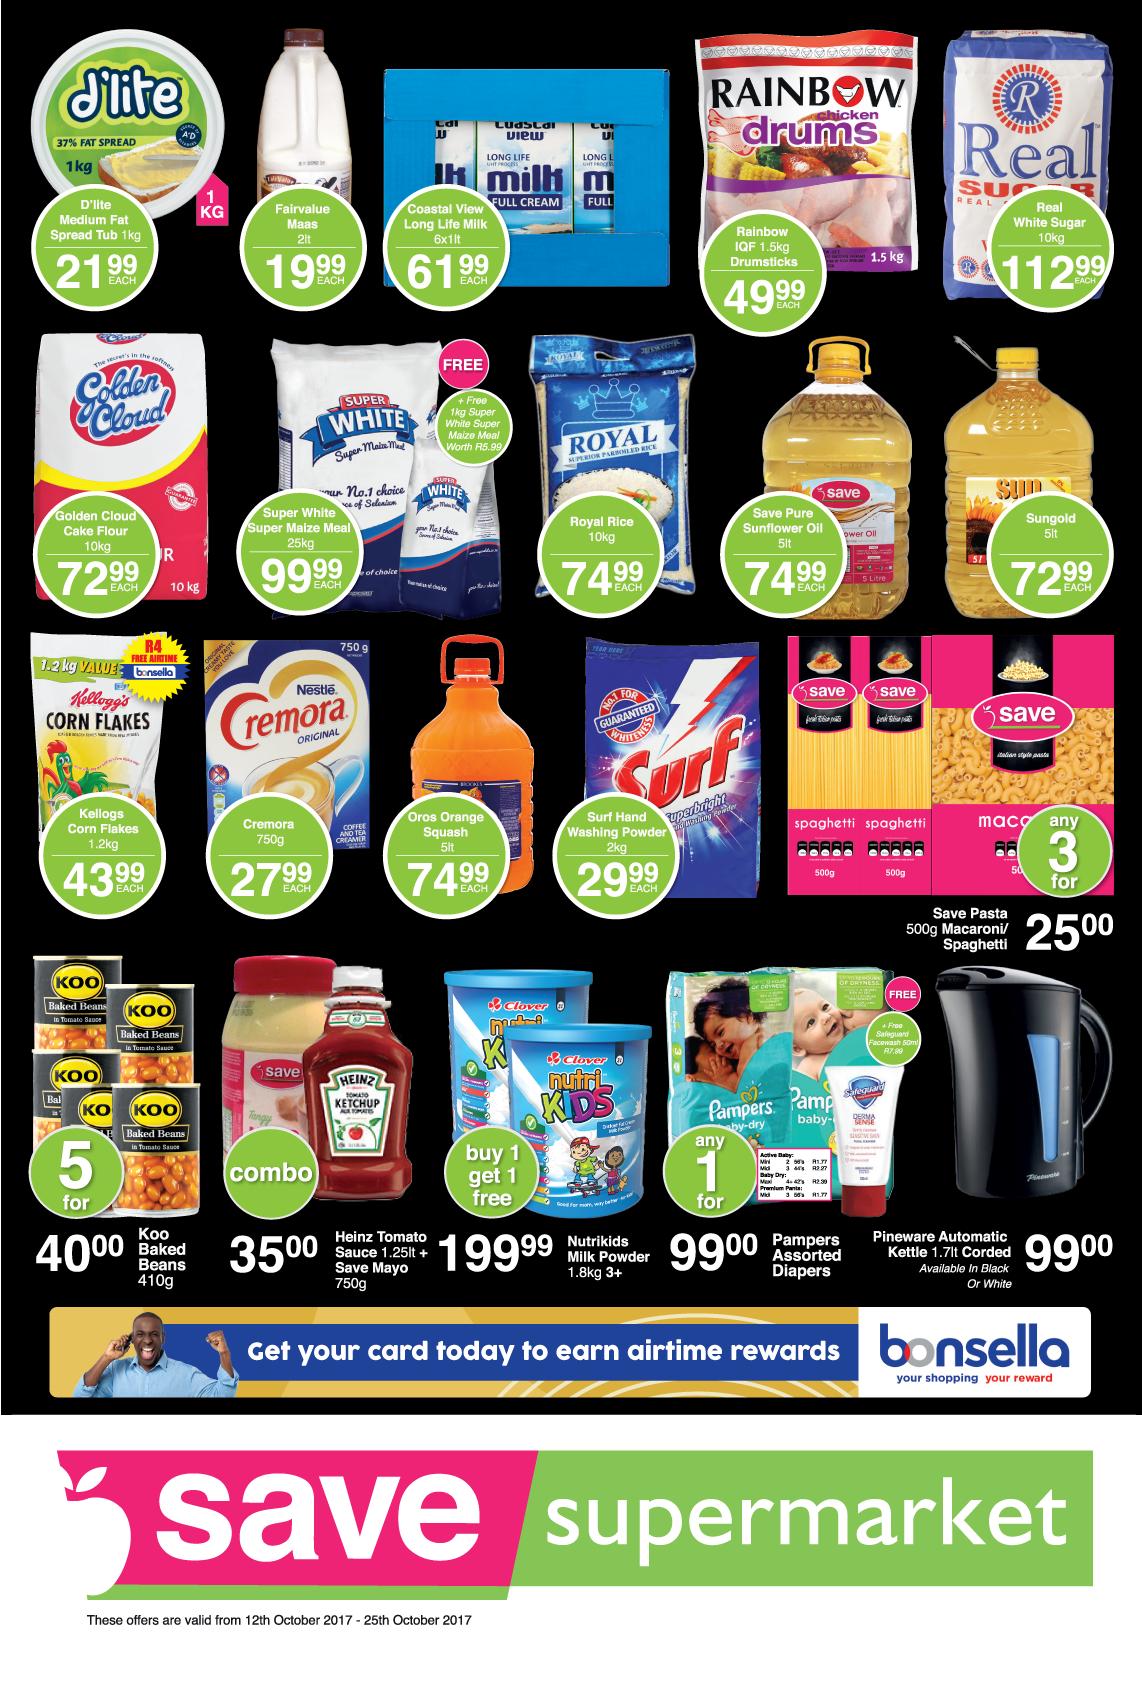 Save Supermarket Howick/Dalton Specials - until 25th October 2017